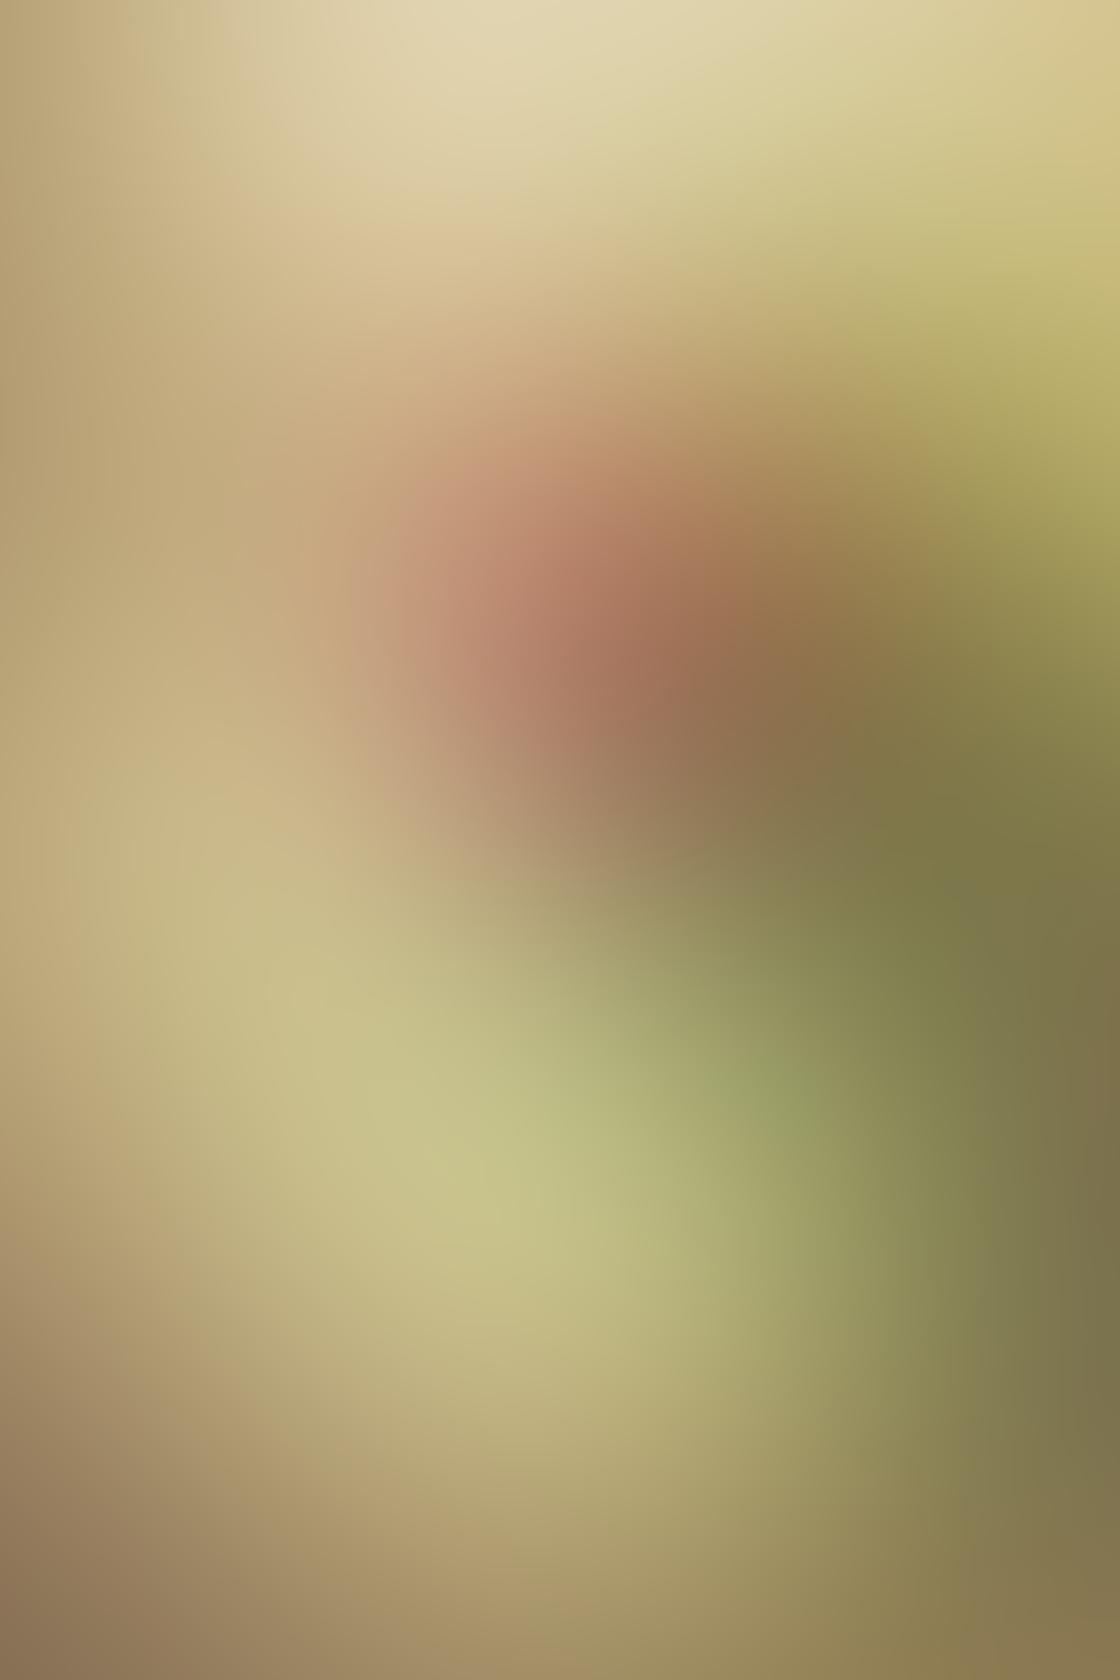 iPhone Photos Low Angle 14